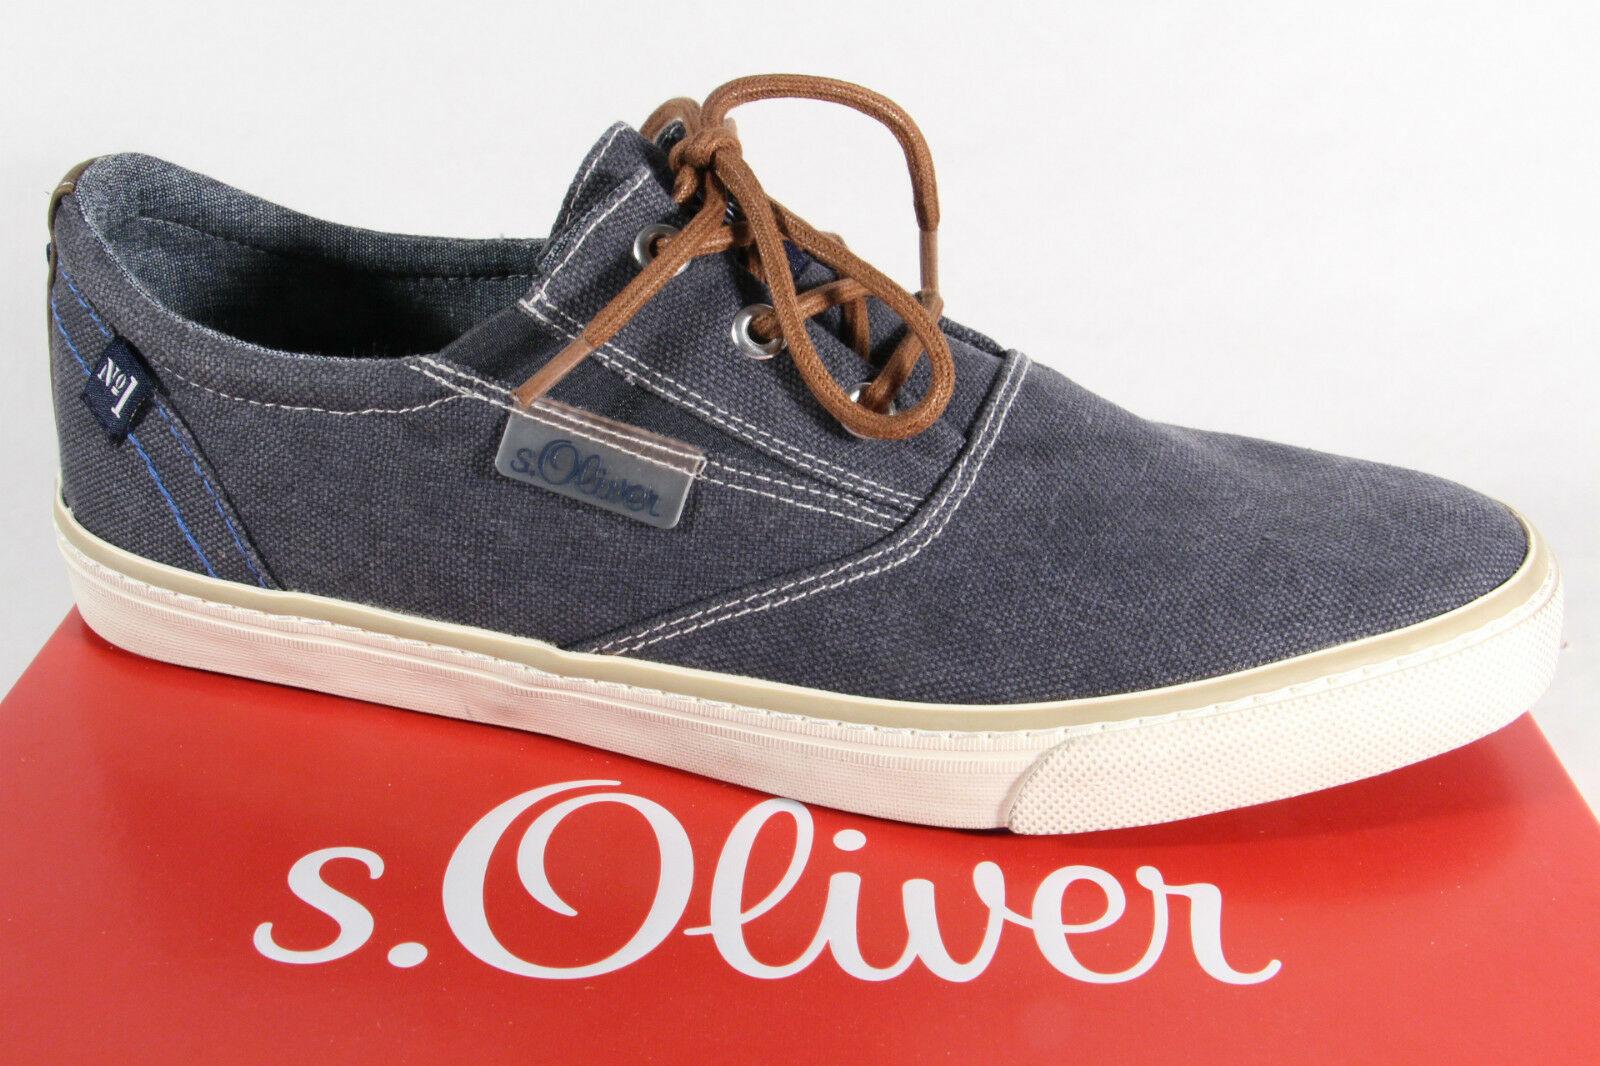 newest e8188 bedb3 s.Oliver Herren Sneakers Halbschuhe Schnürschuhe blau 13613 NEU